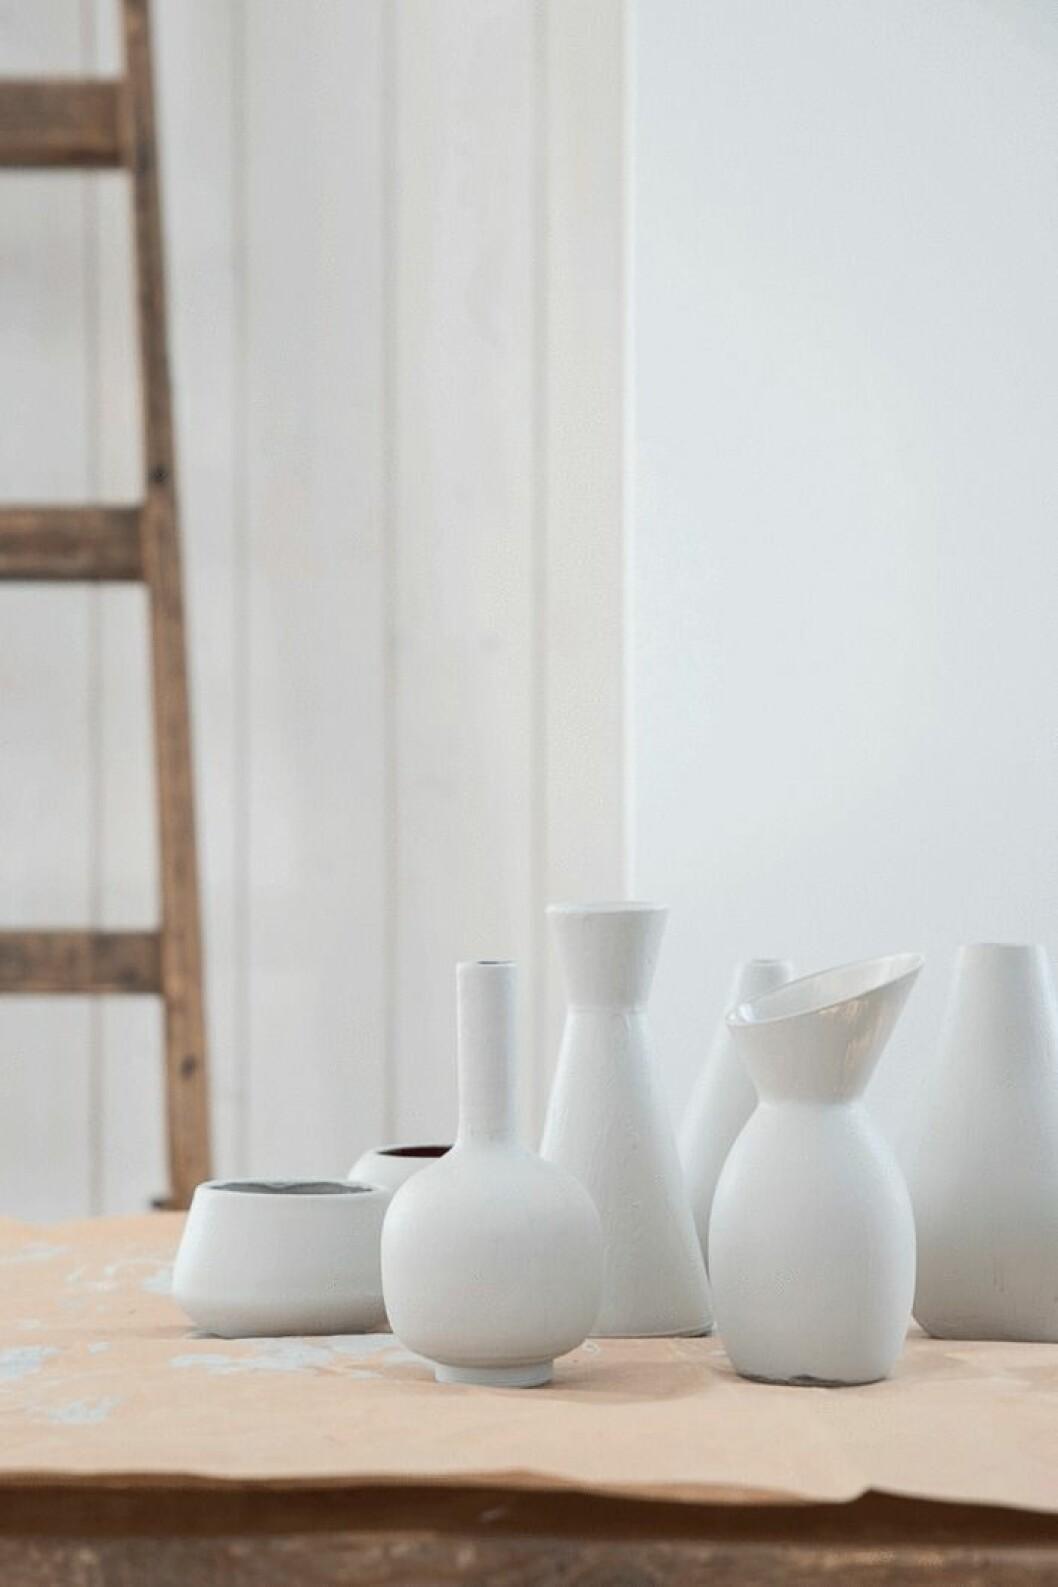 Vacker nymålad keramik.